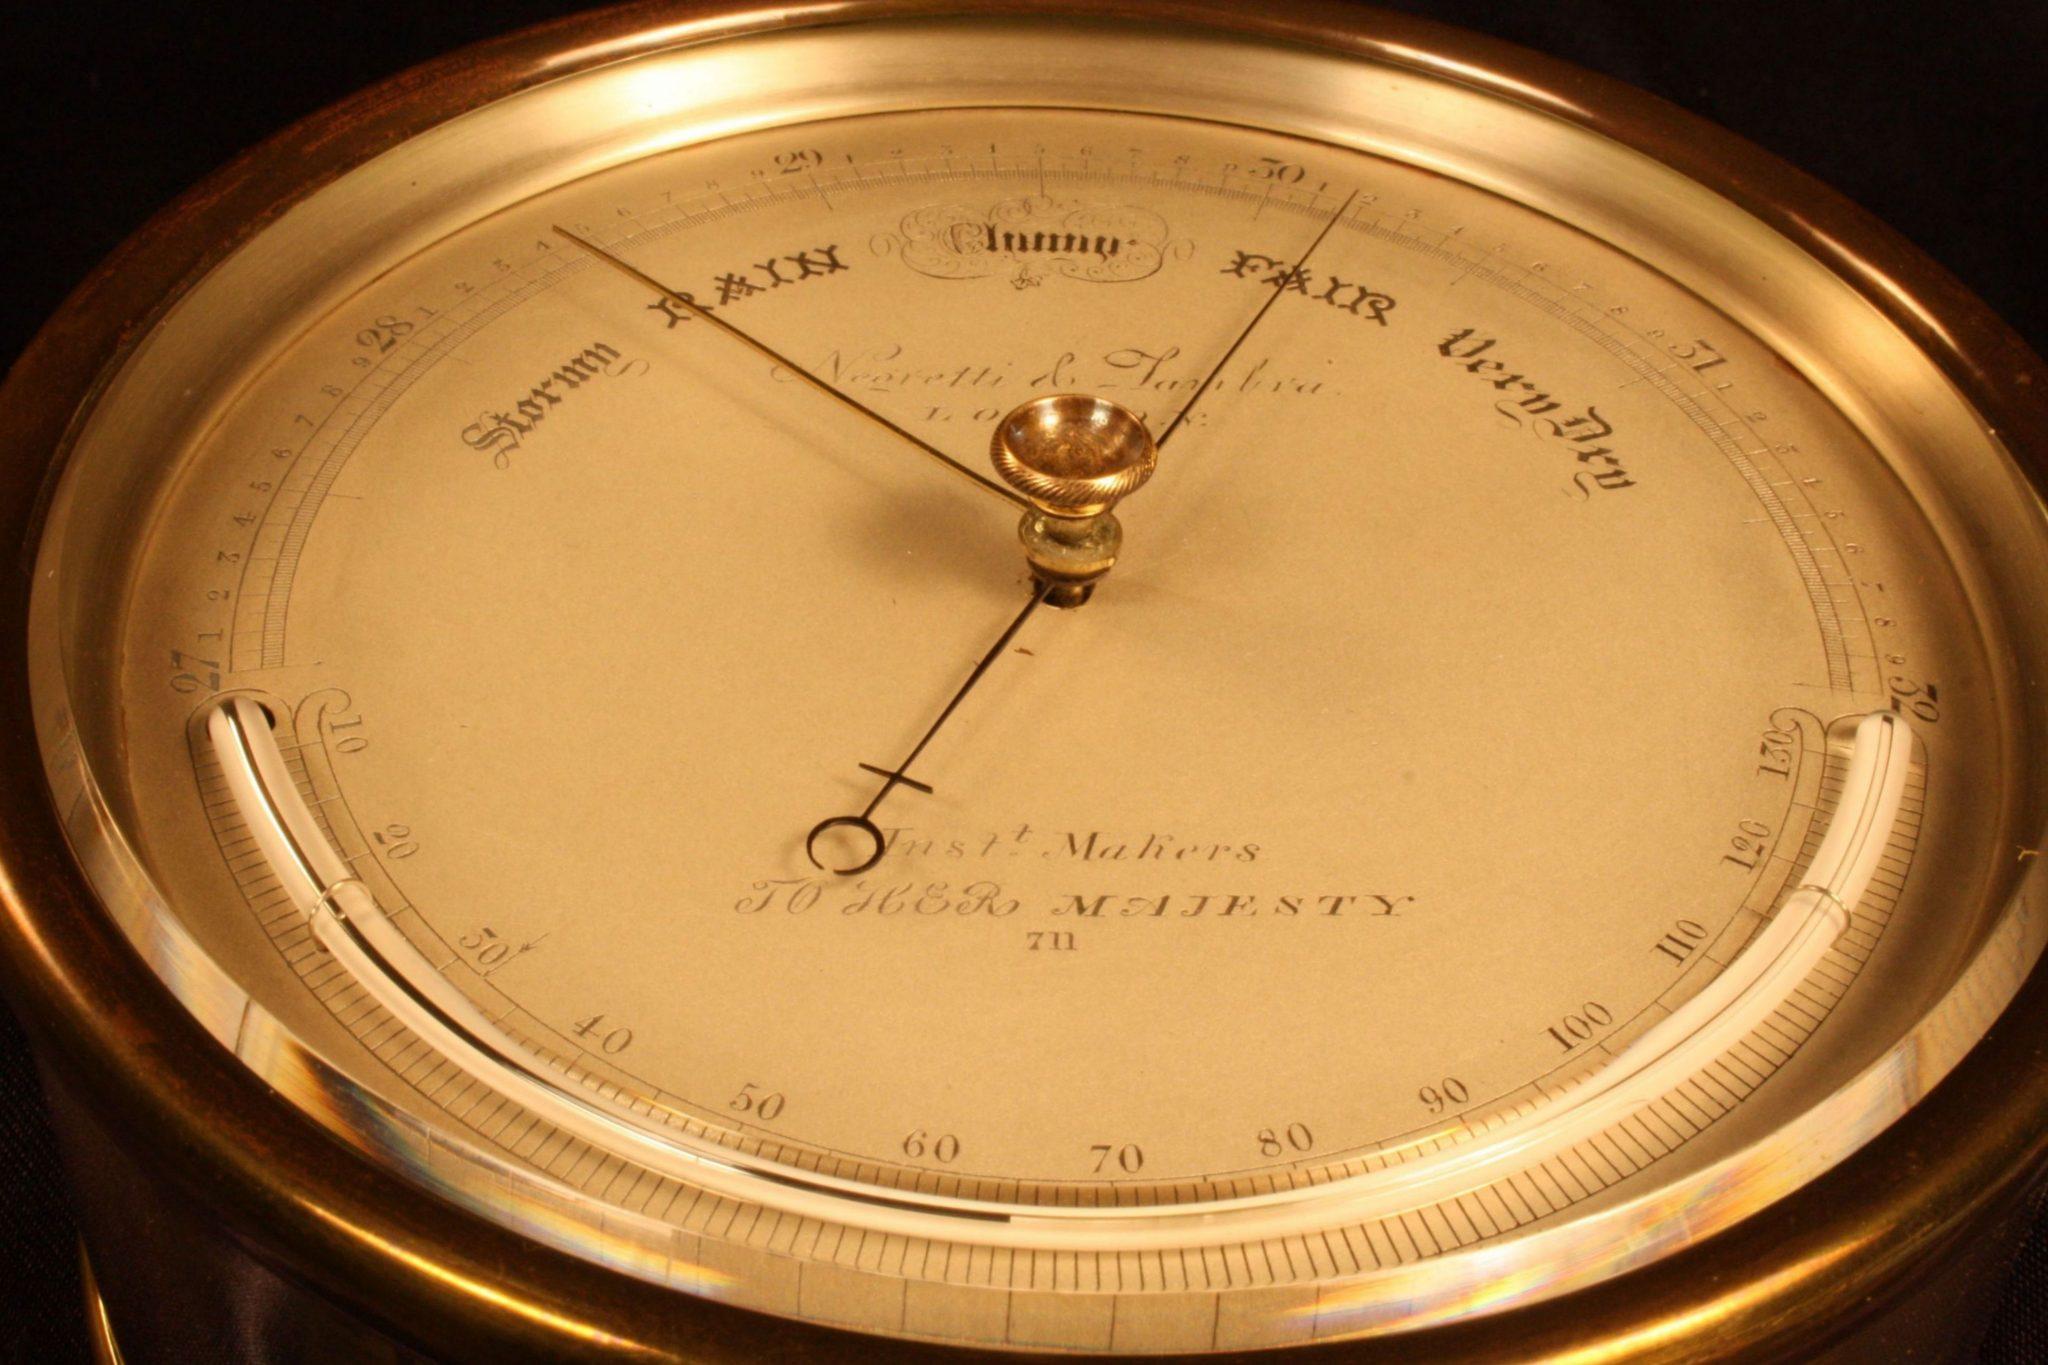 Image of Negretti & Zambra Barometer No 711 c1858